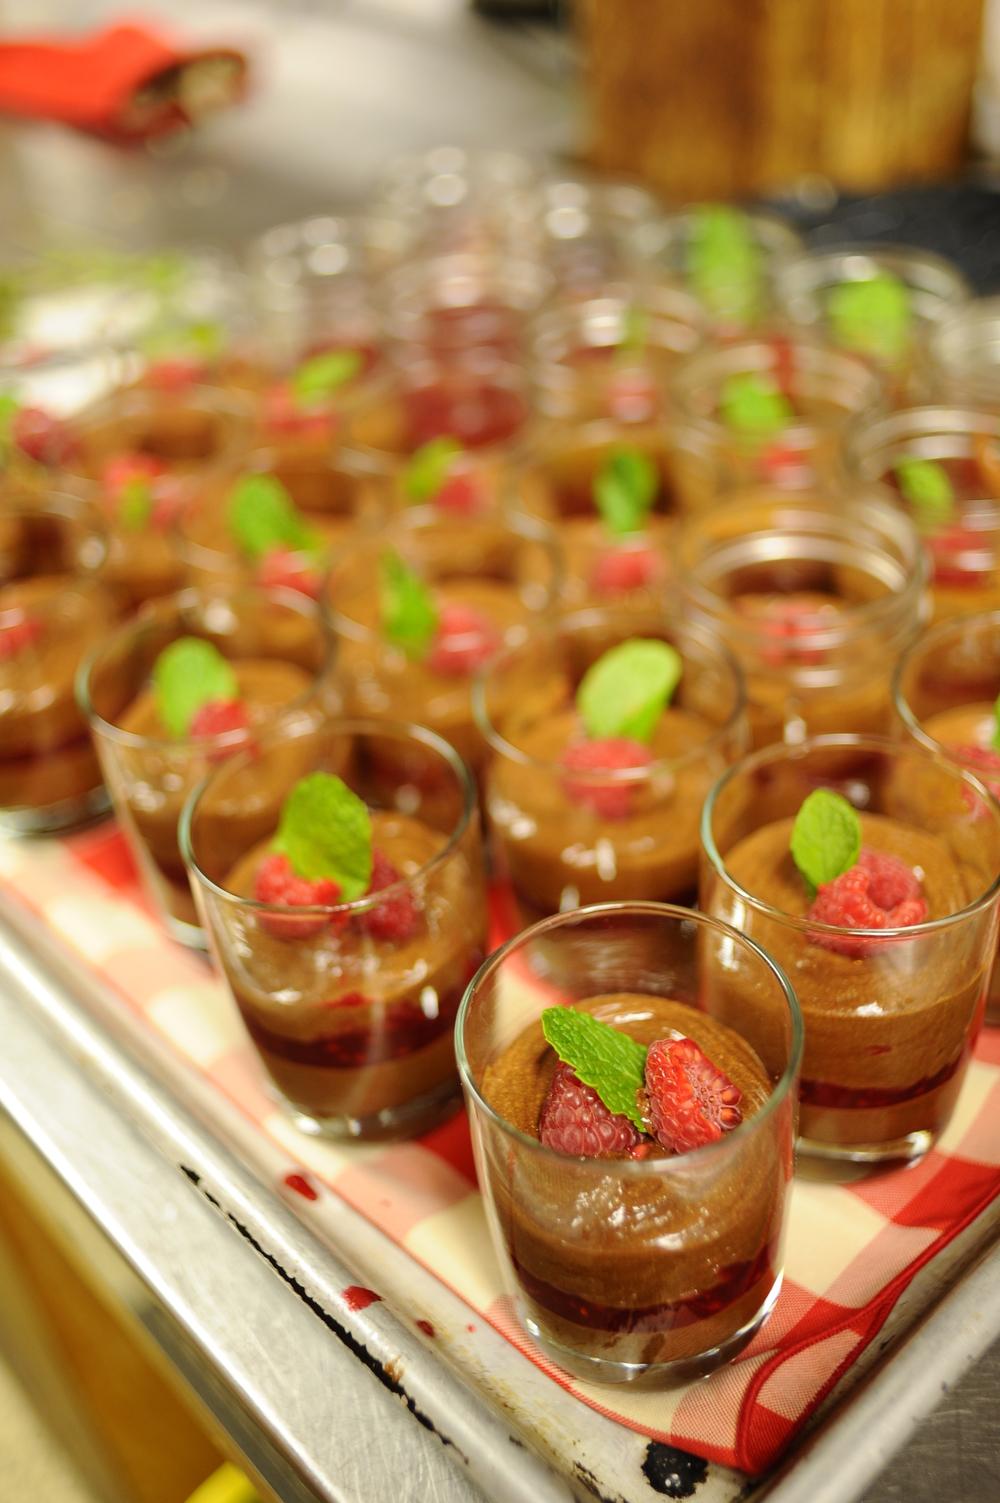 raspberry dessert.JPG